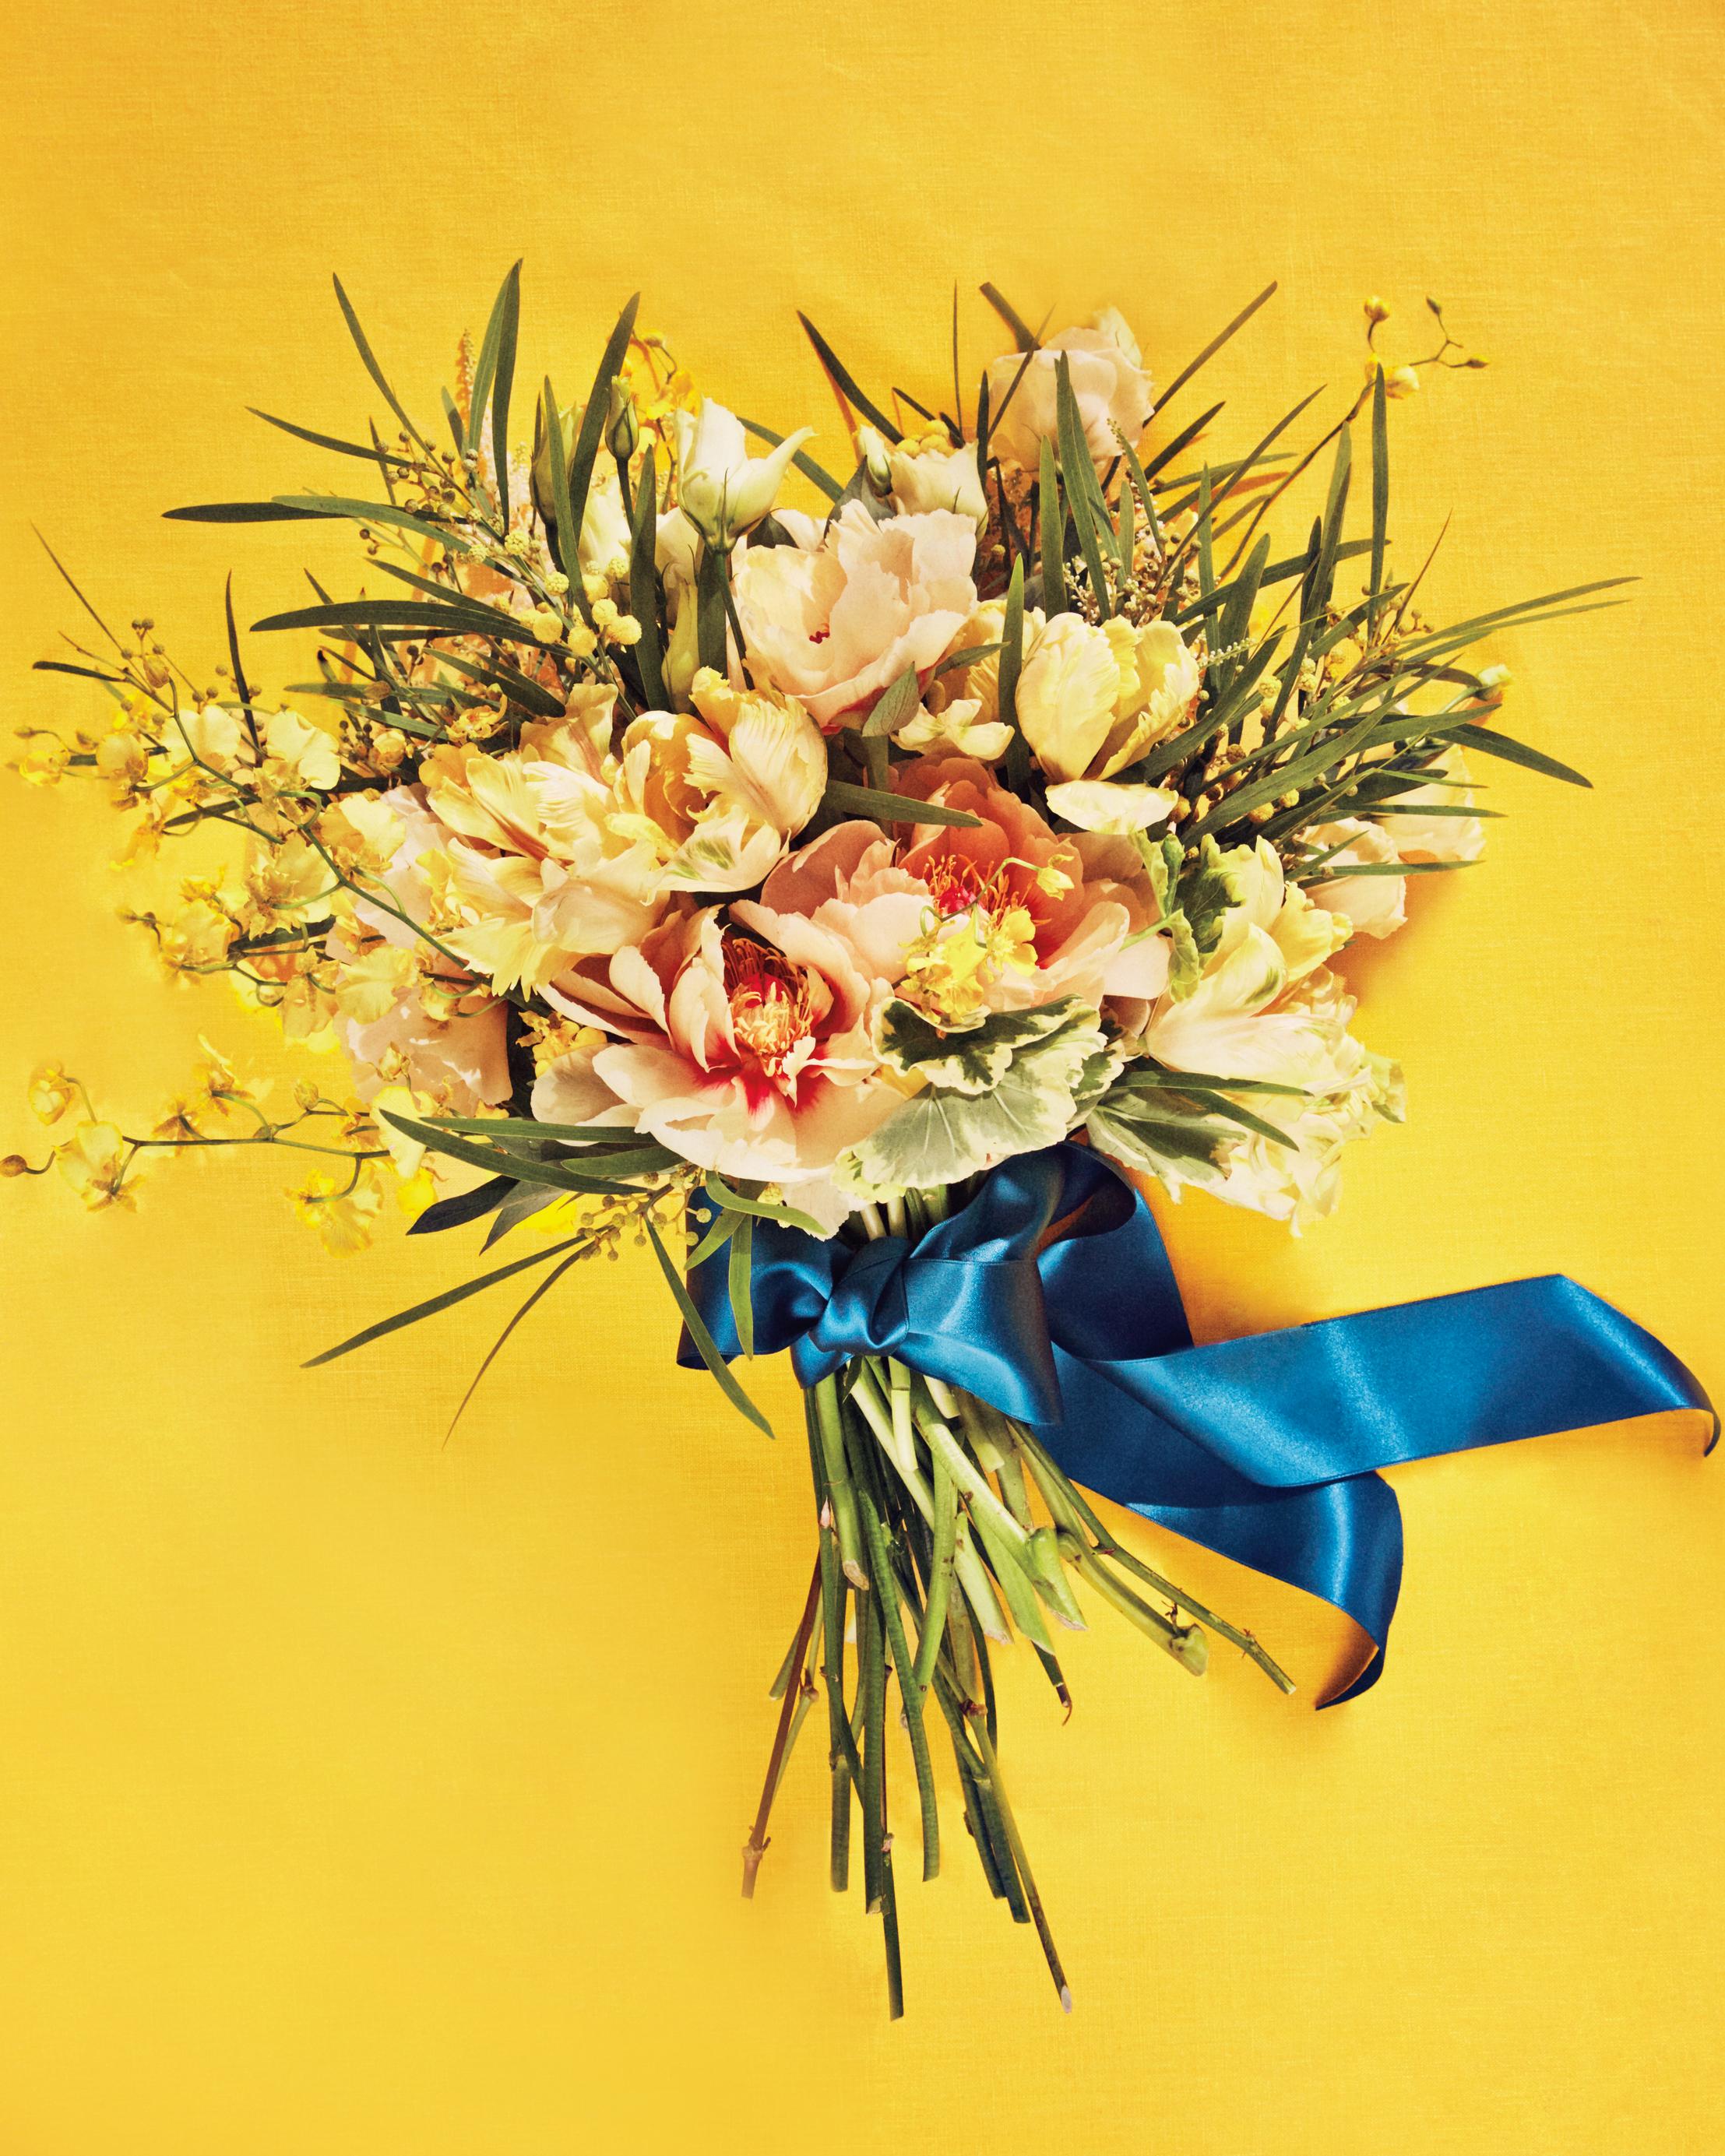 bouquet-openers-blue-ribbon-v1-0103-d111716.jpg